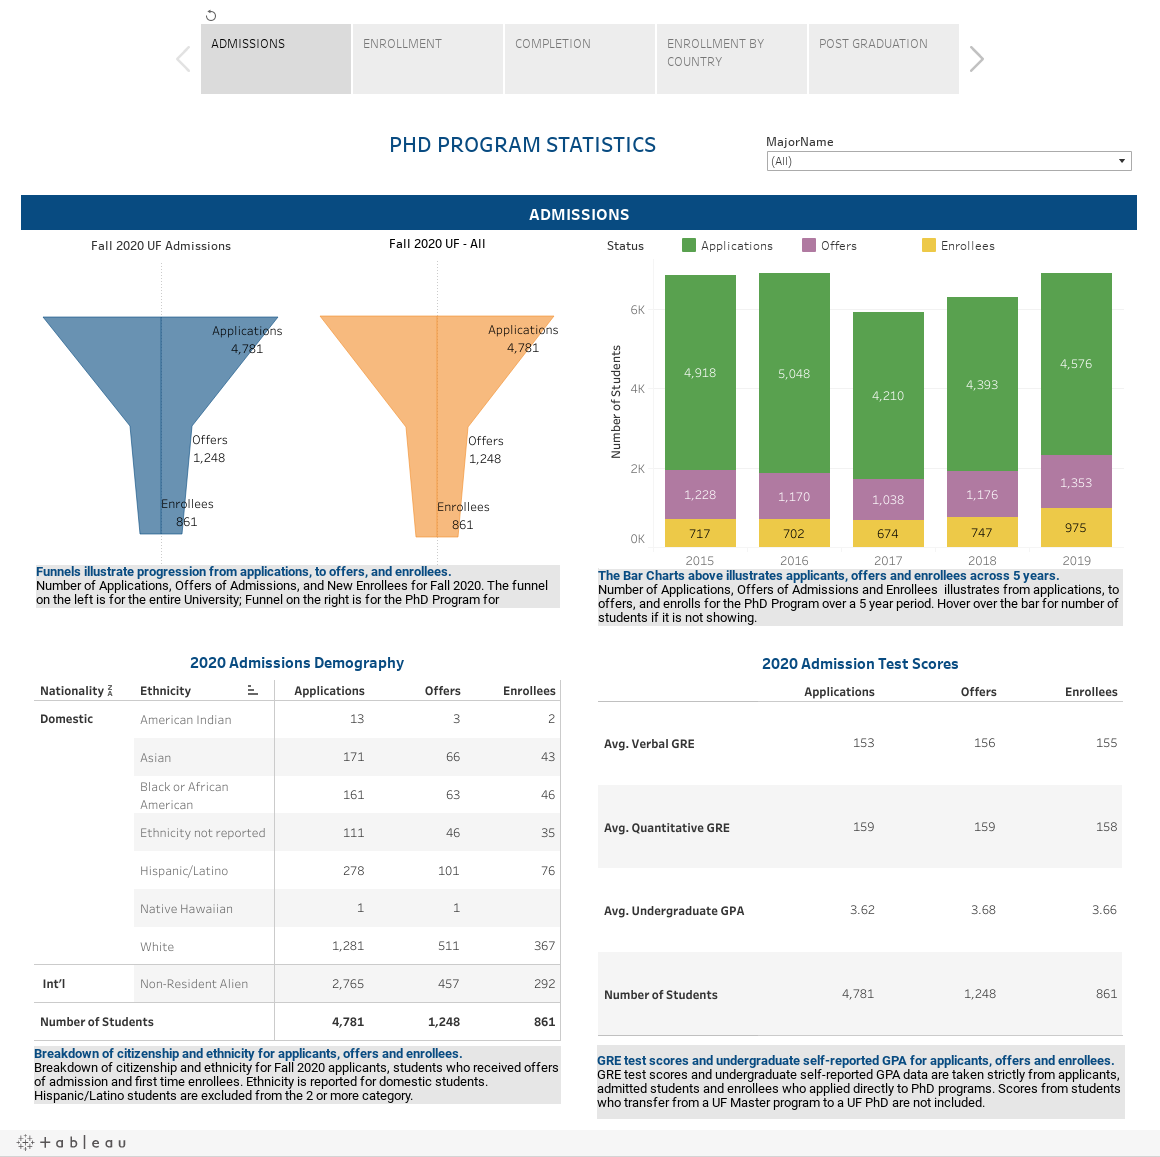 PHD PROGRAM STATISTICS